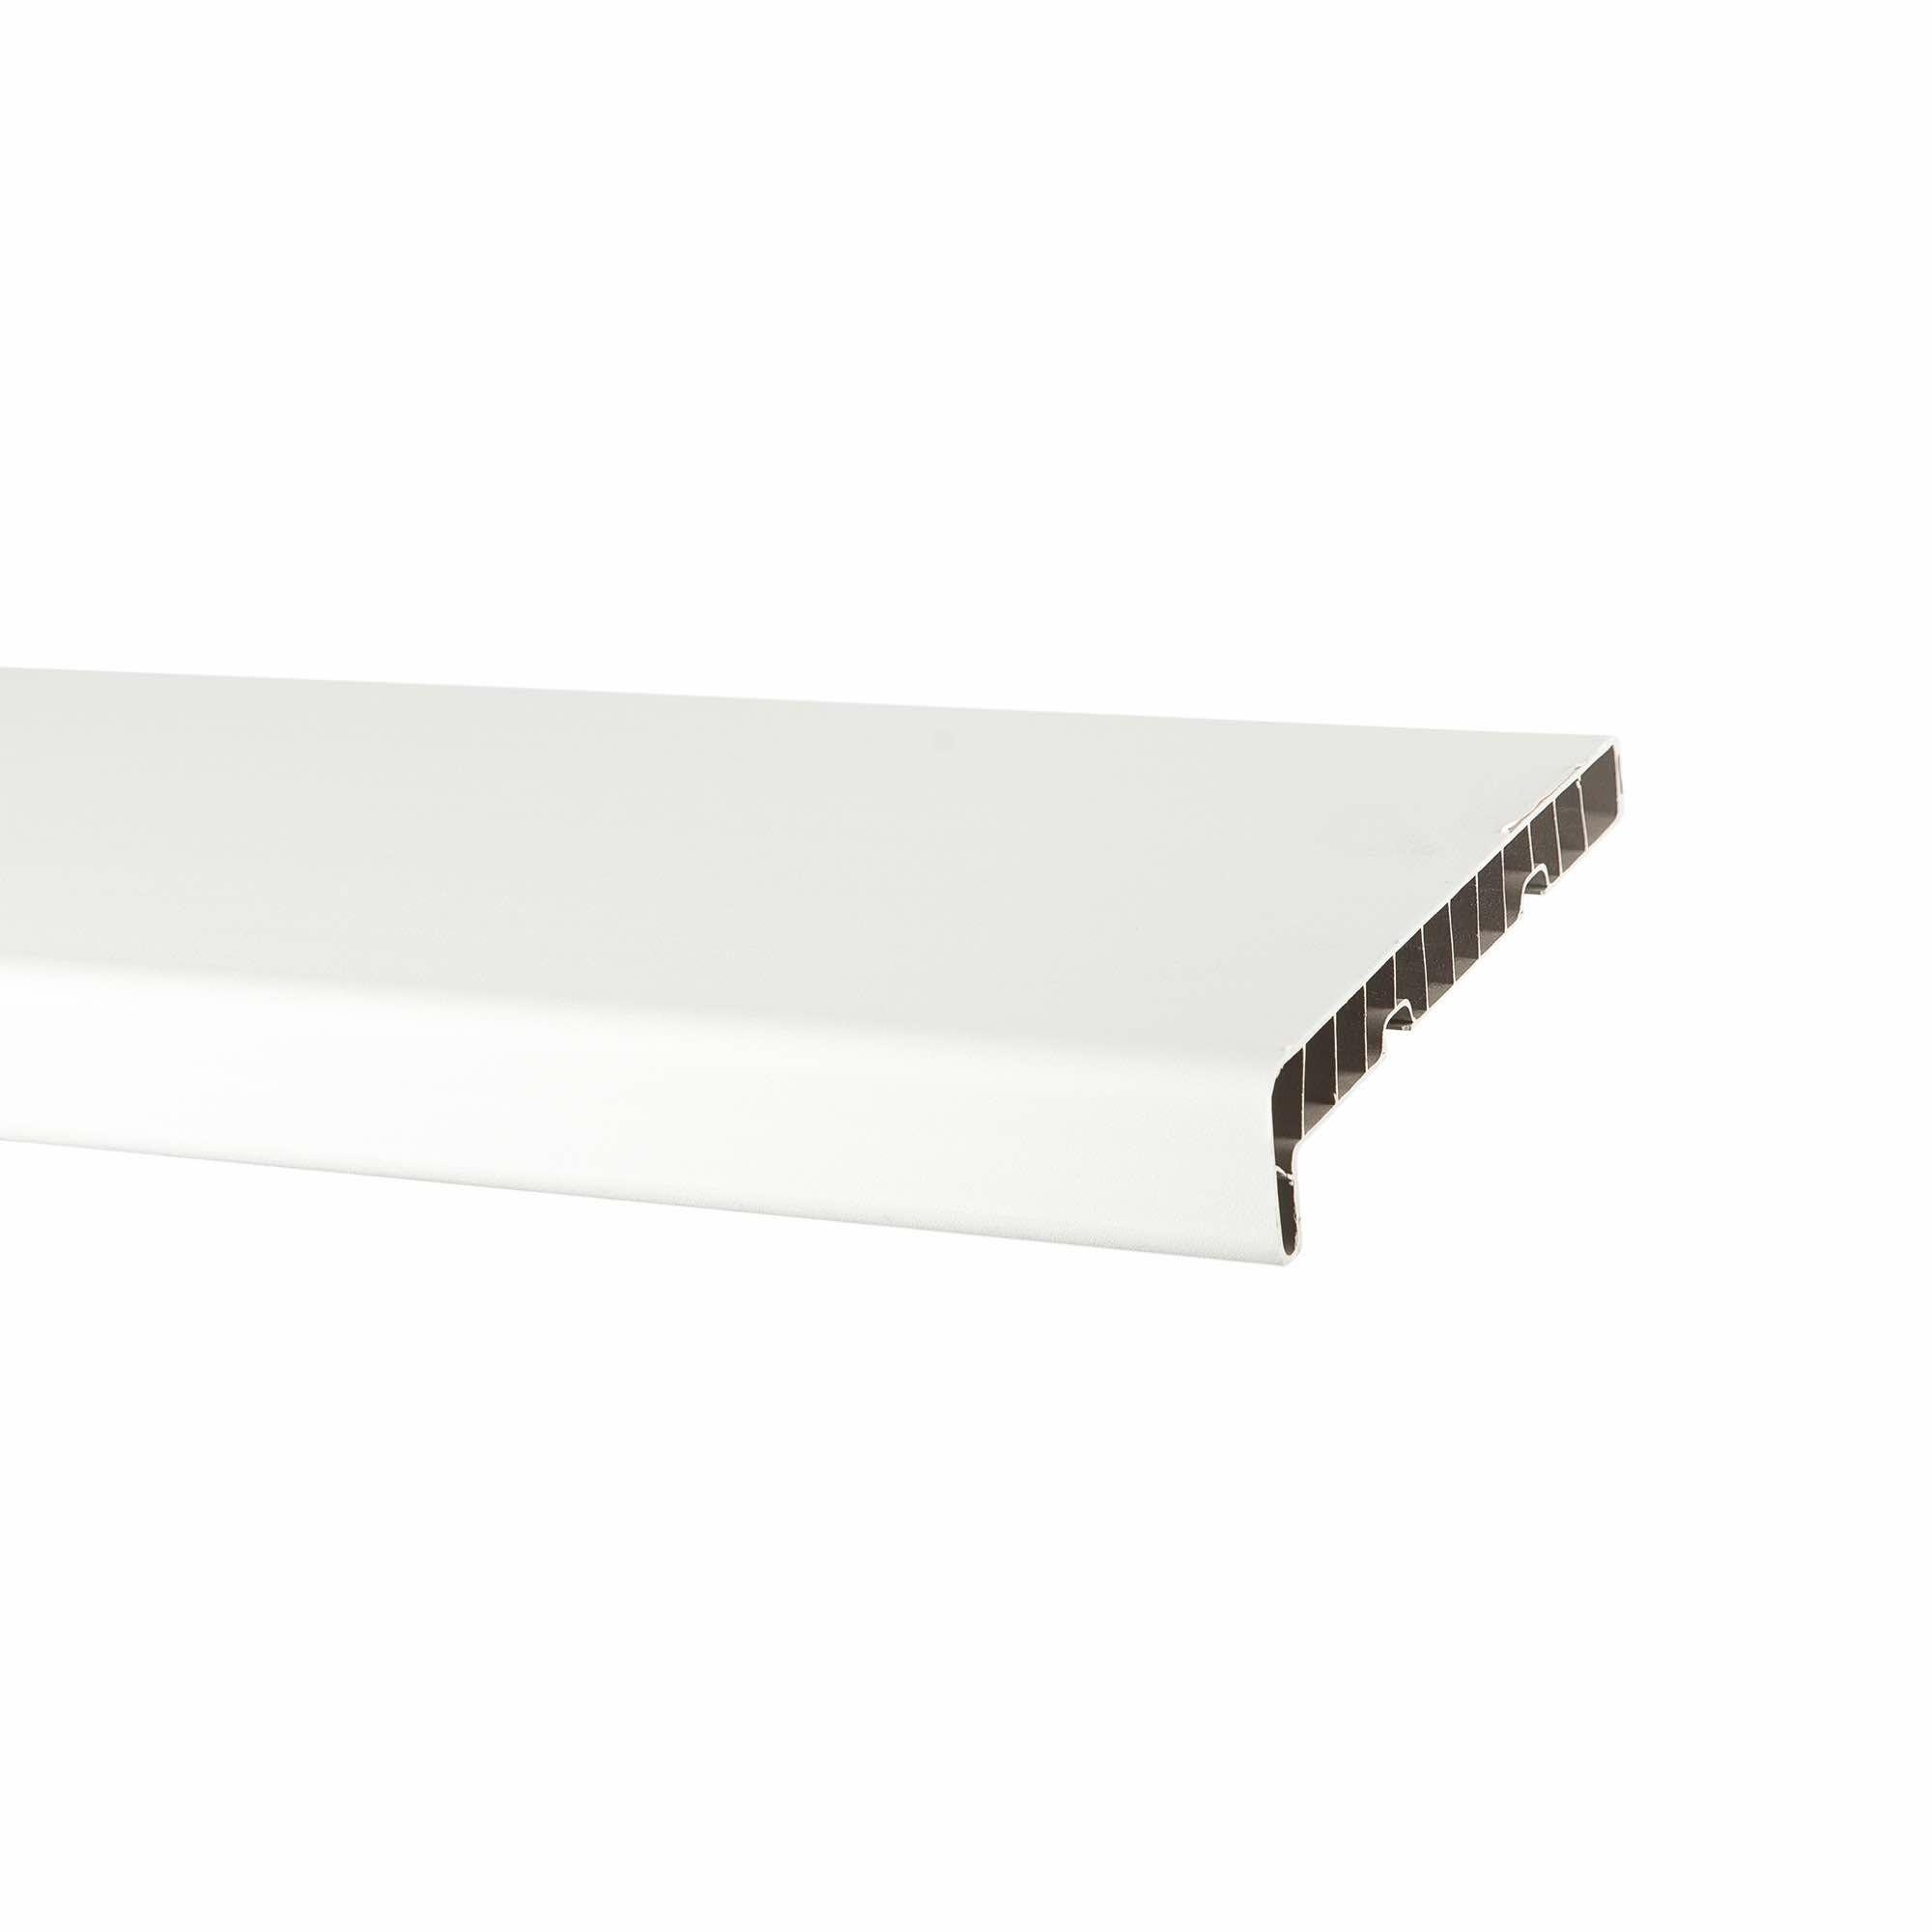 Glaf Pvc Pentru Interior Alb 300 X 15 Cm